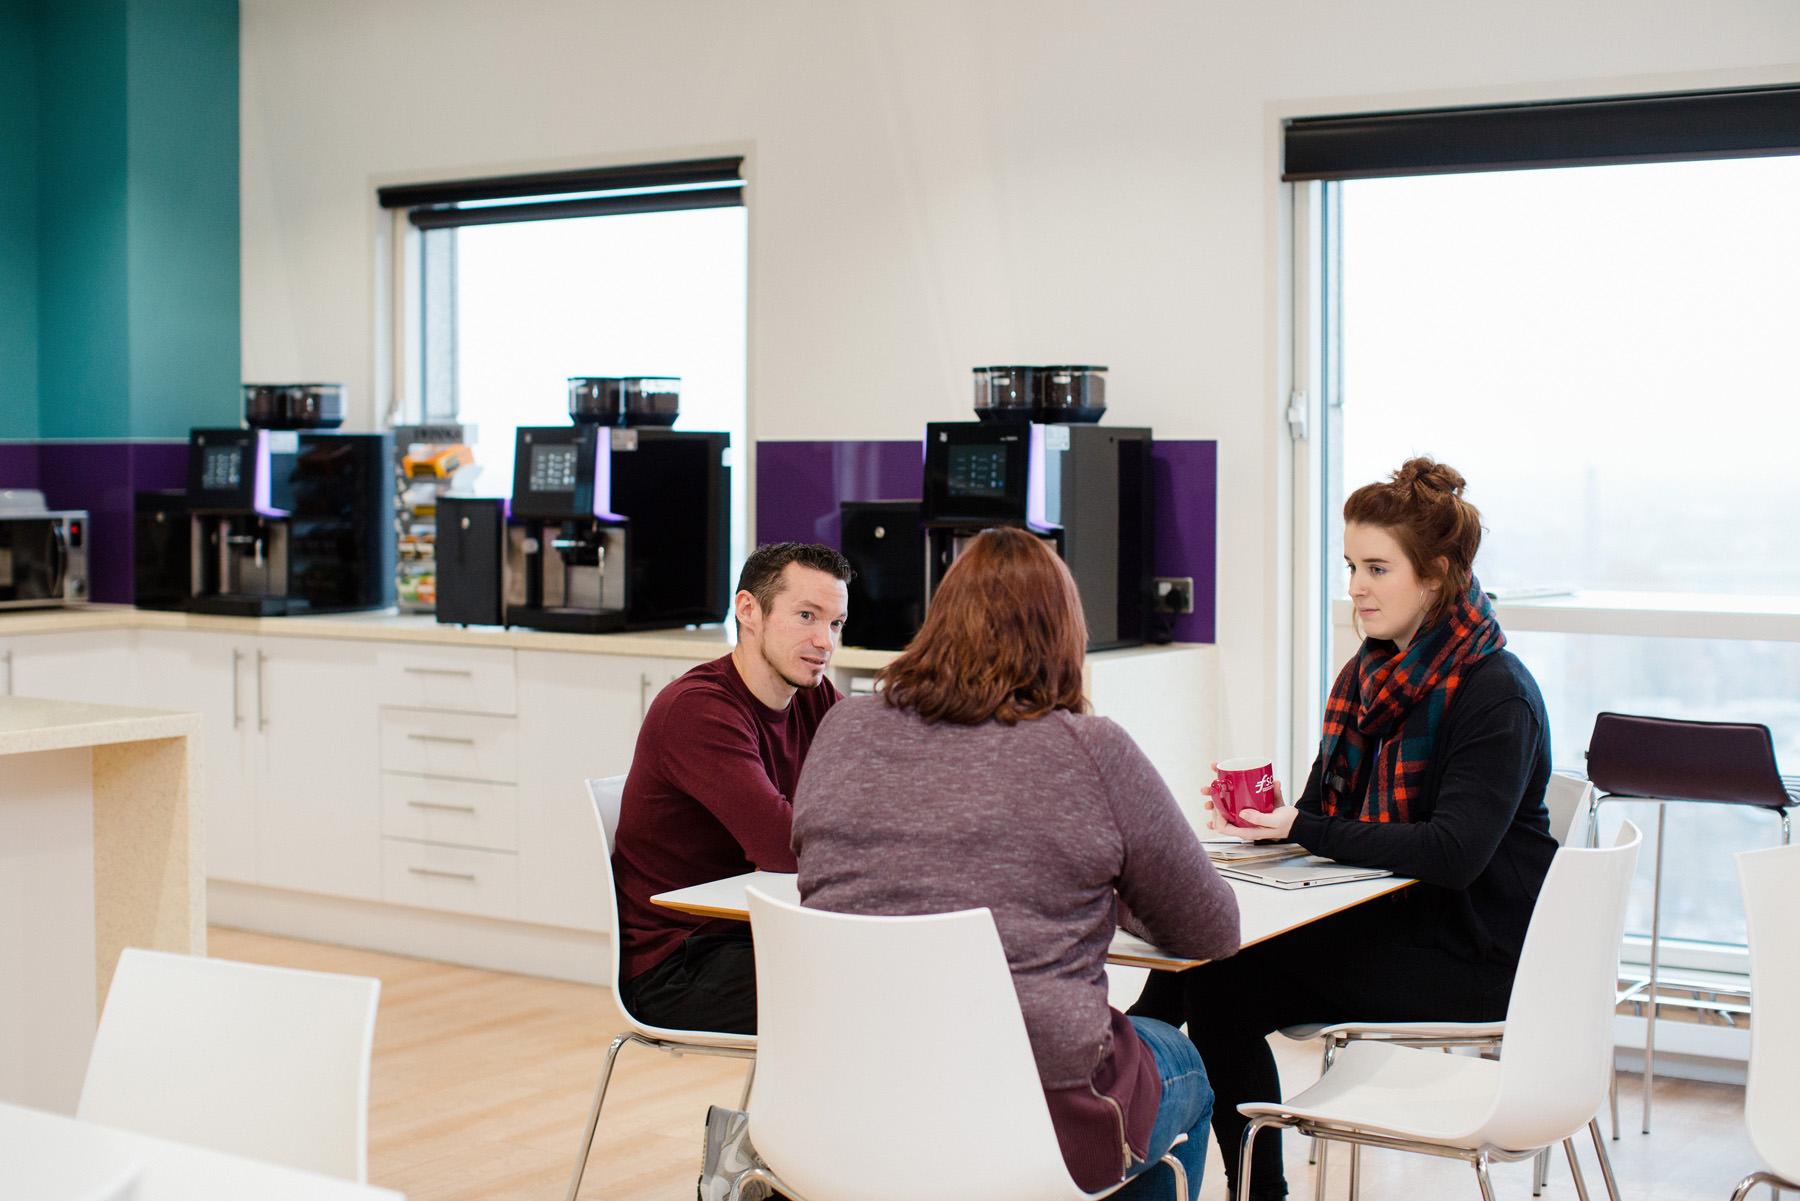 fscs-age-friendly-employer-renegade-generation-cafeteria-3.jpg